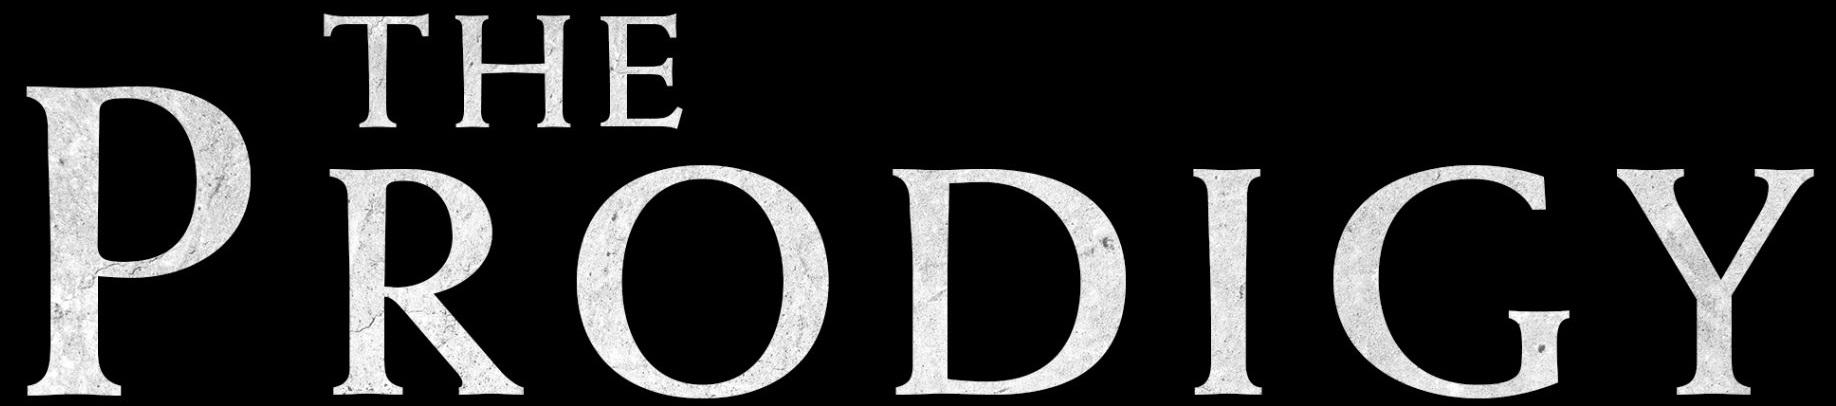 The Prodigy (film)